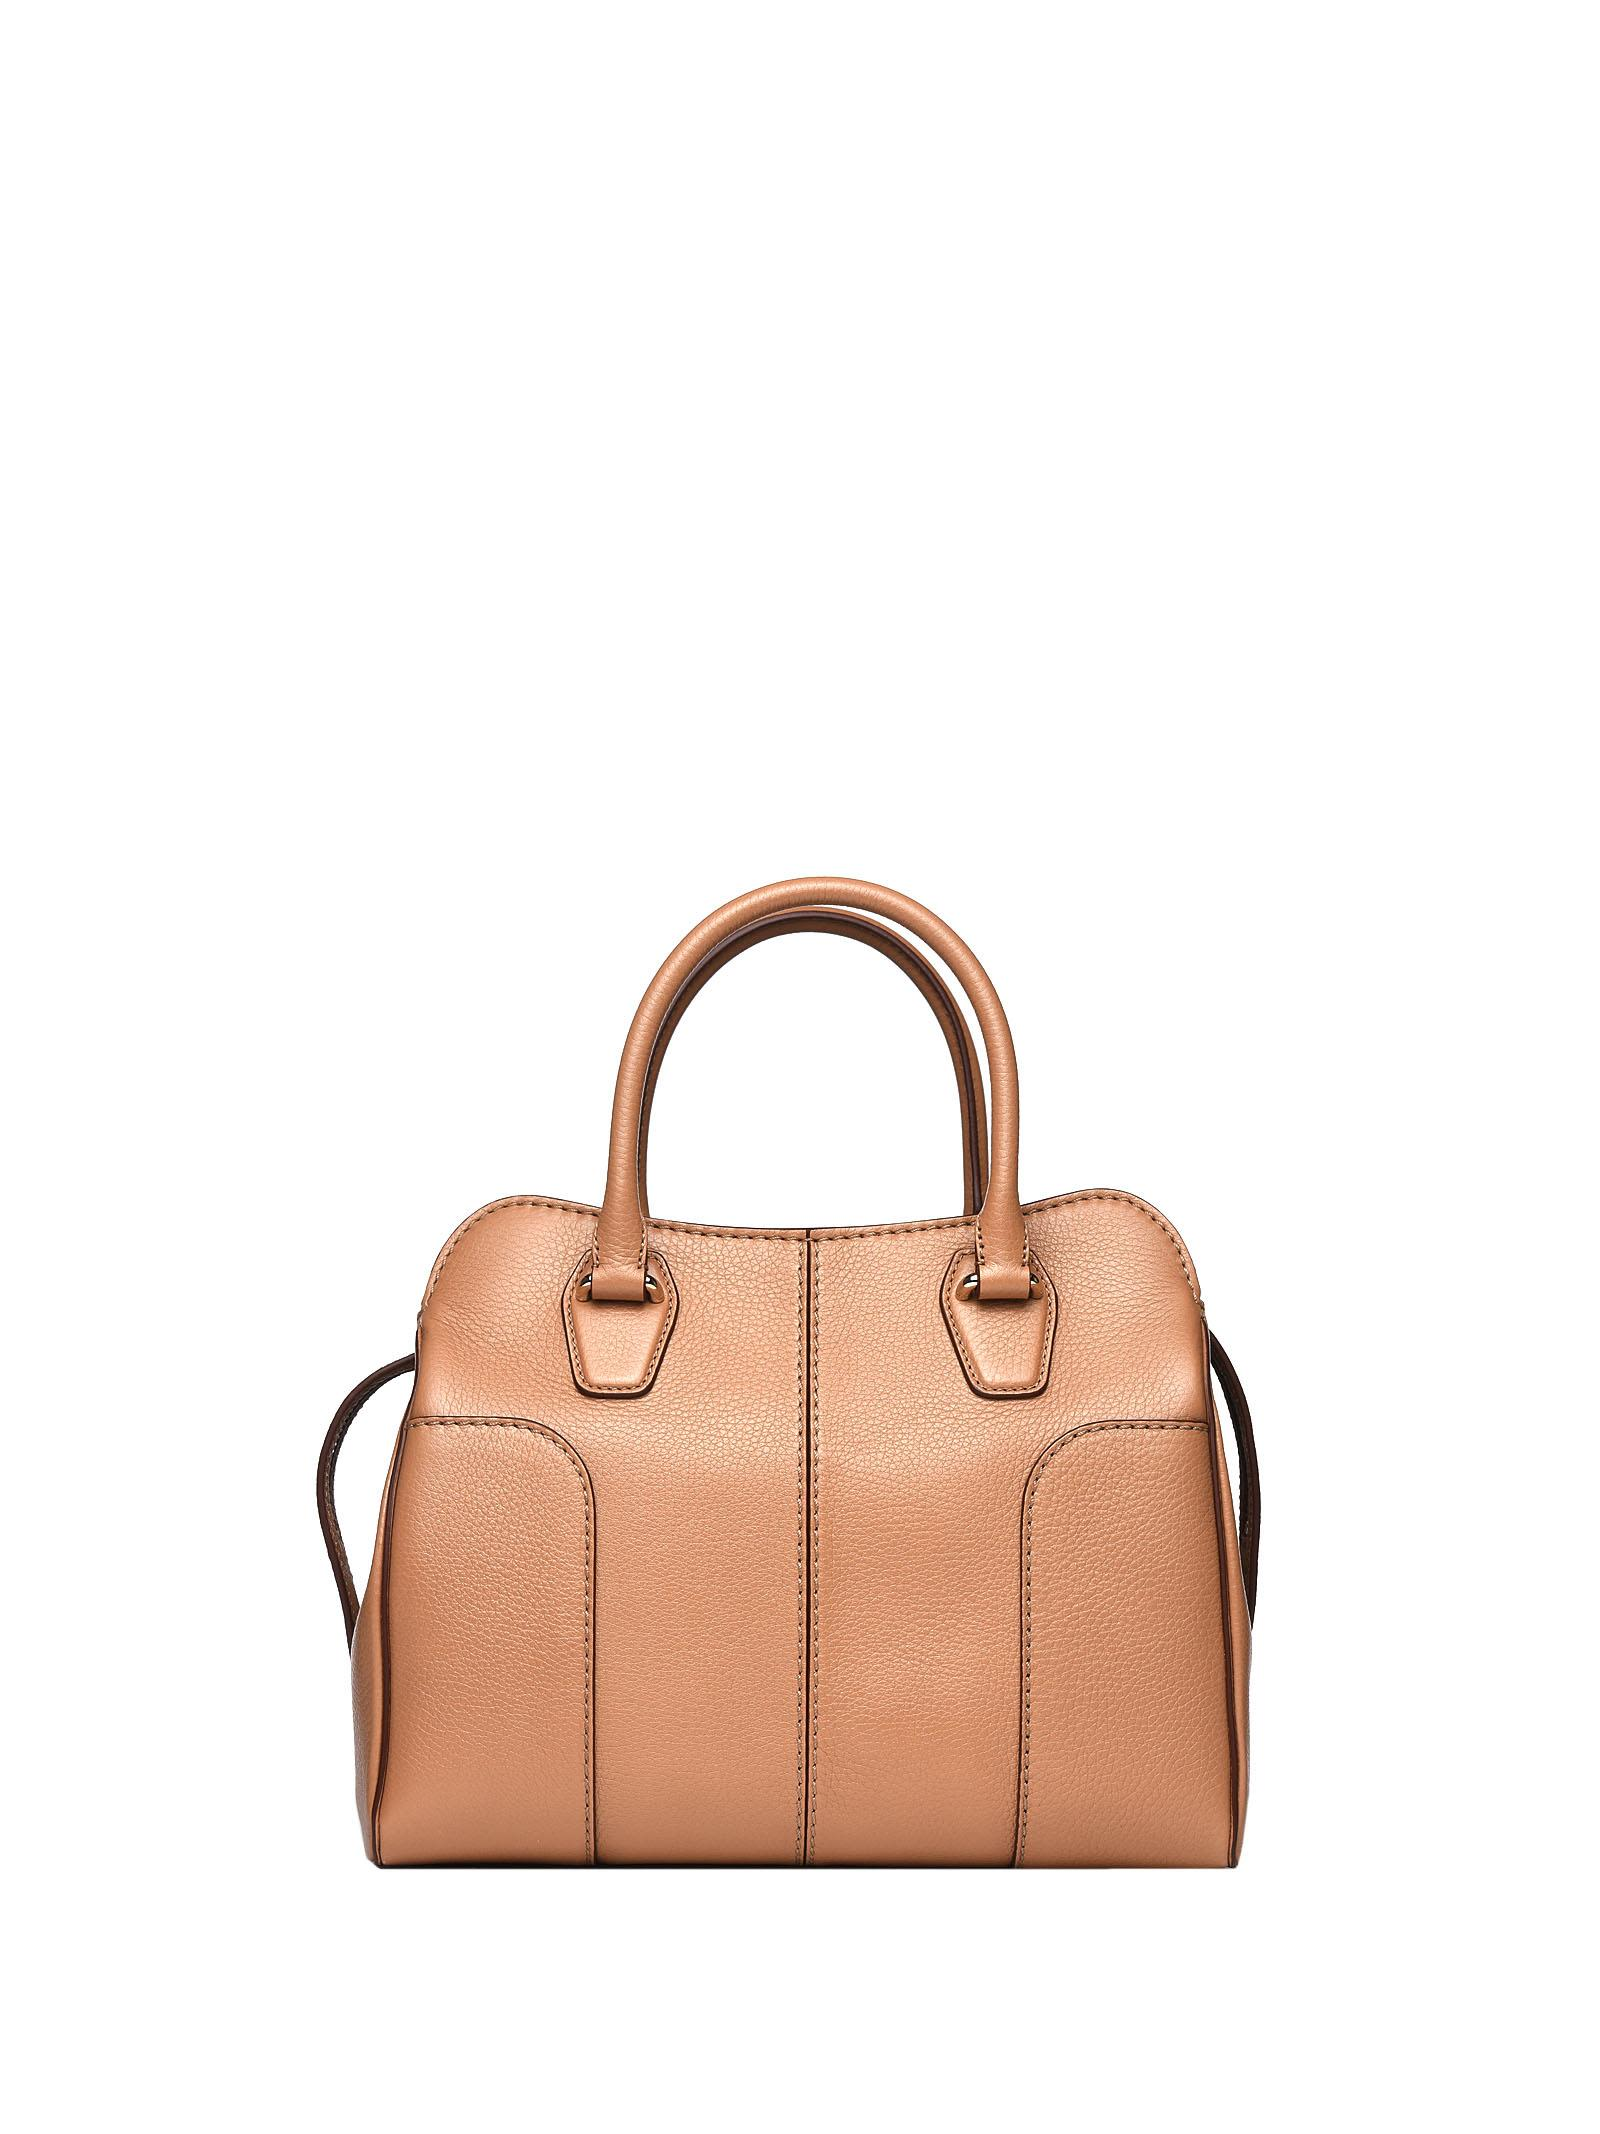 Sella Handle Bag In Light Tobacco Leather in Tabacco Chiaro